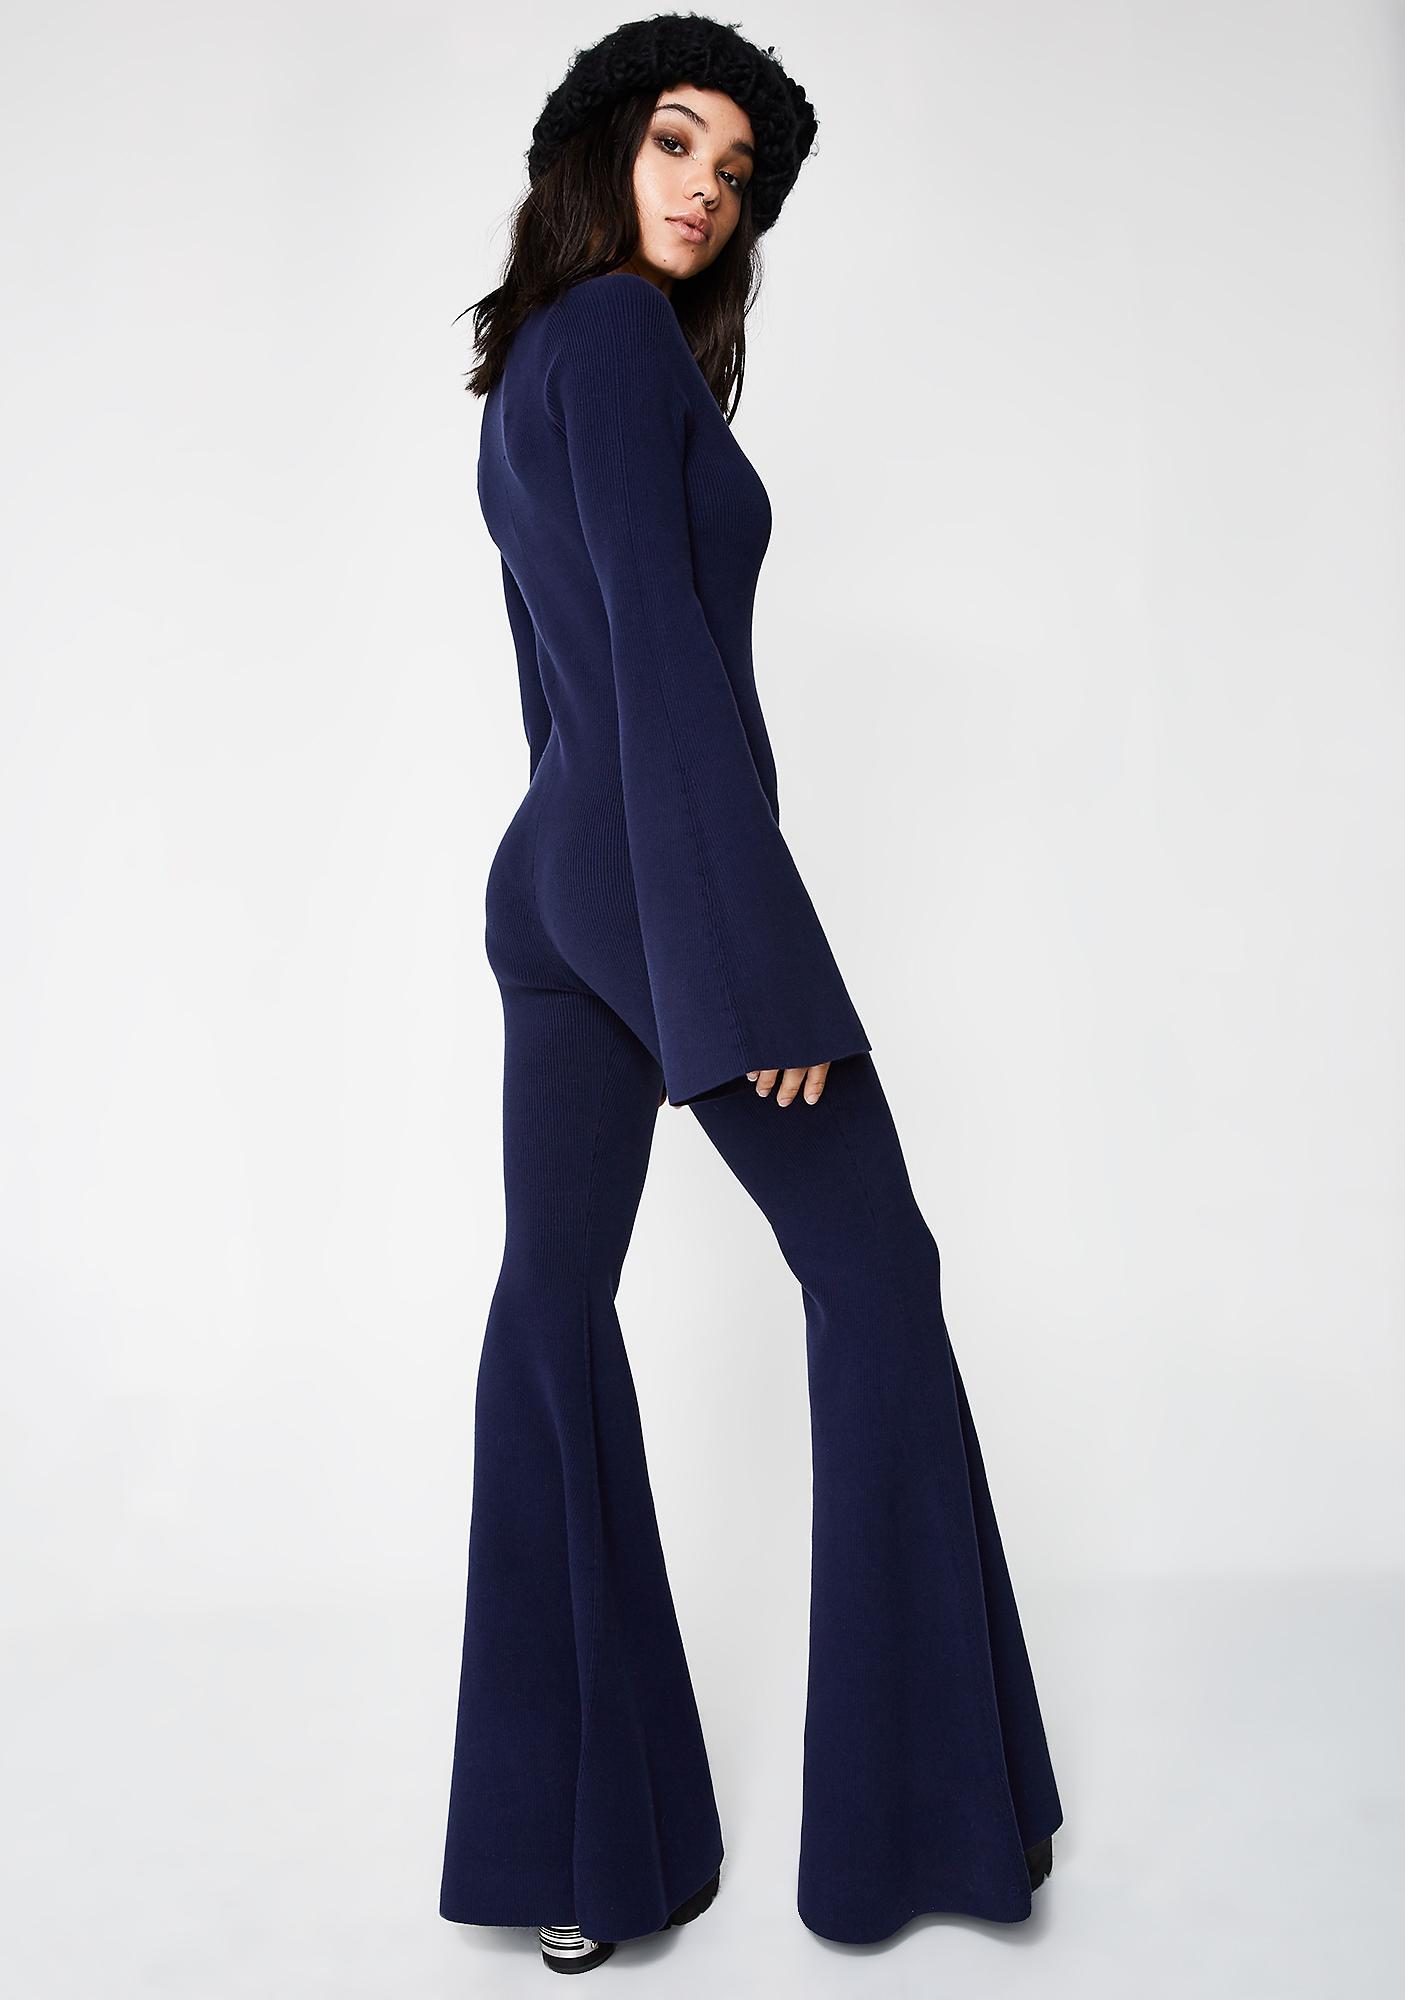 296470d54ee ... PUMA FENTY PUMA By Rihanna Navy Deep V Sweater Knit One Piece ...